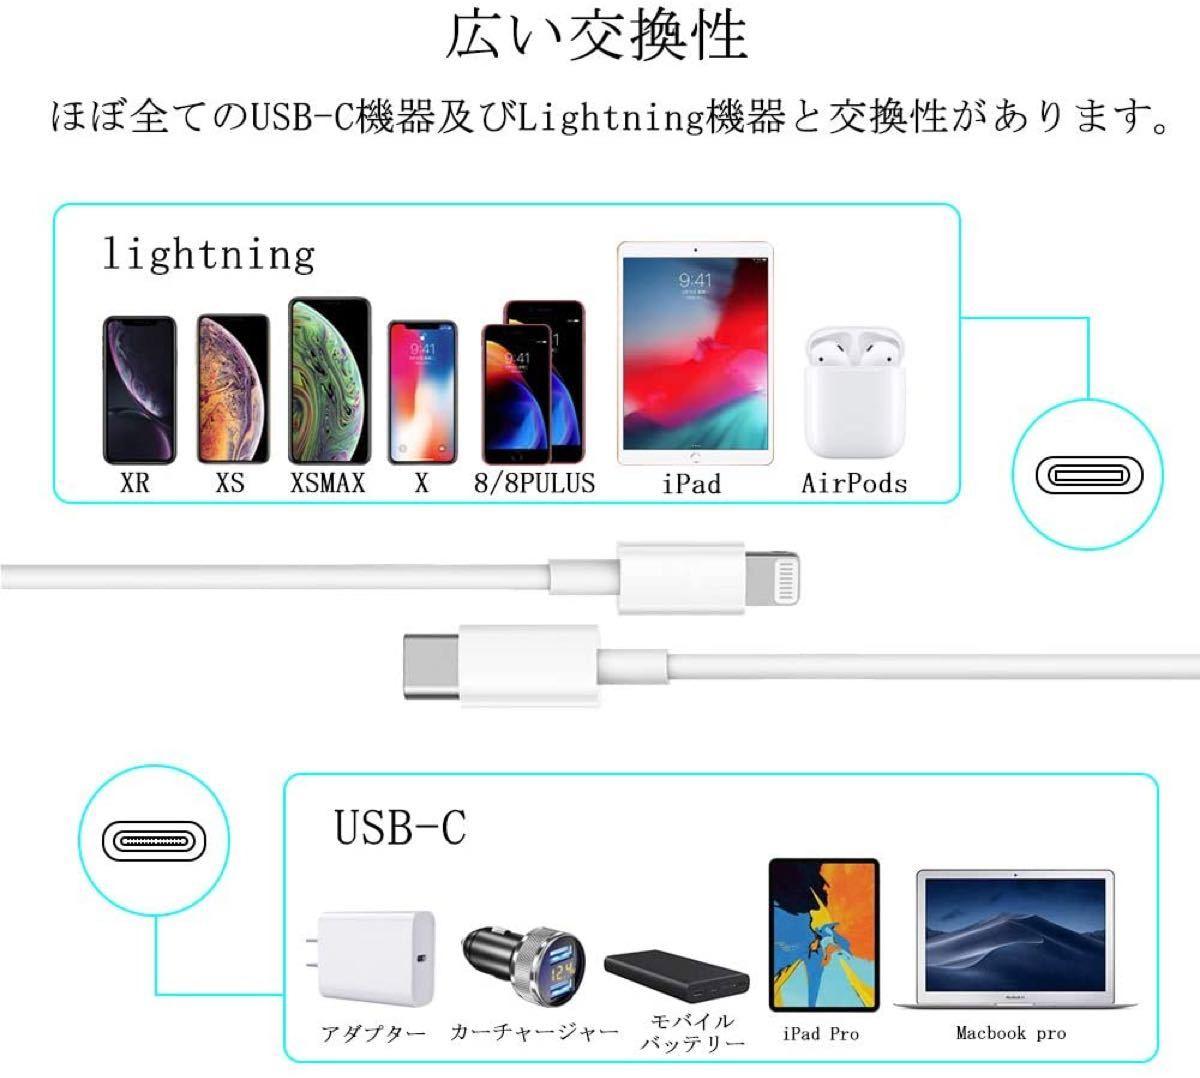 1M 正規品 USB type-c to Lightning 充電ケーブル 純正品質 PD対応